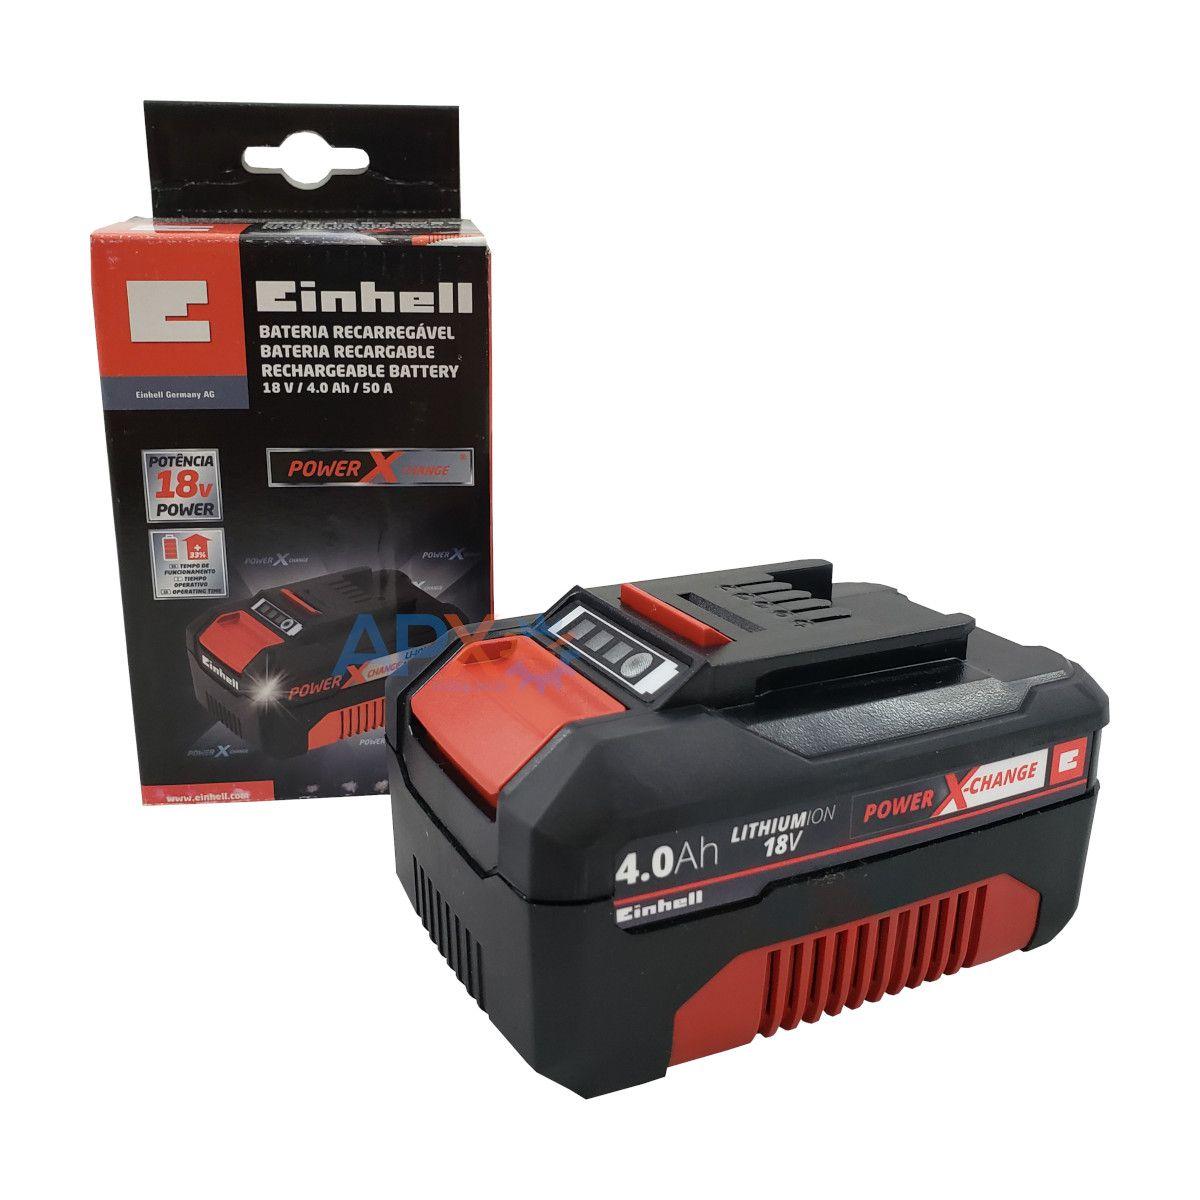 Bateria de 4.0 Ah power X-Change 18V Einhell - 4511412